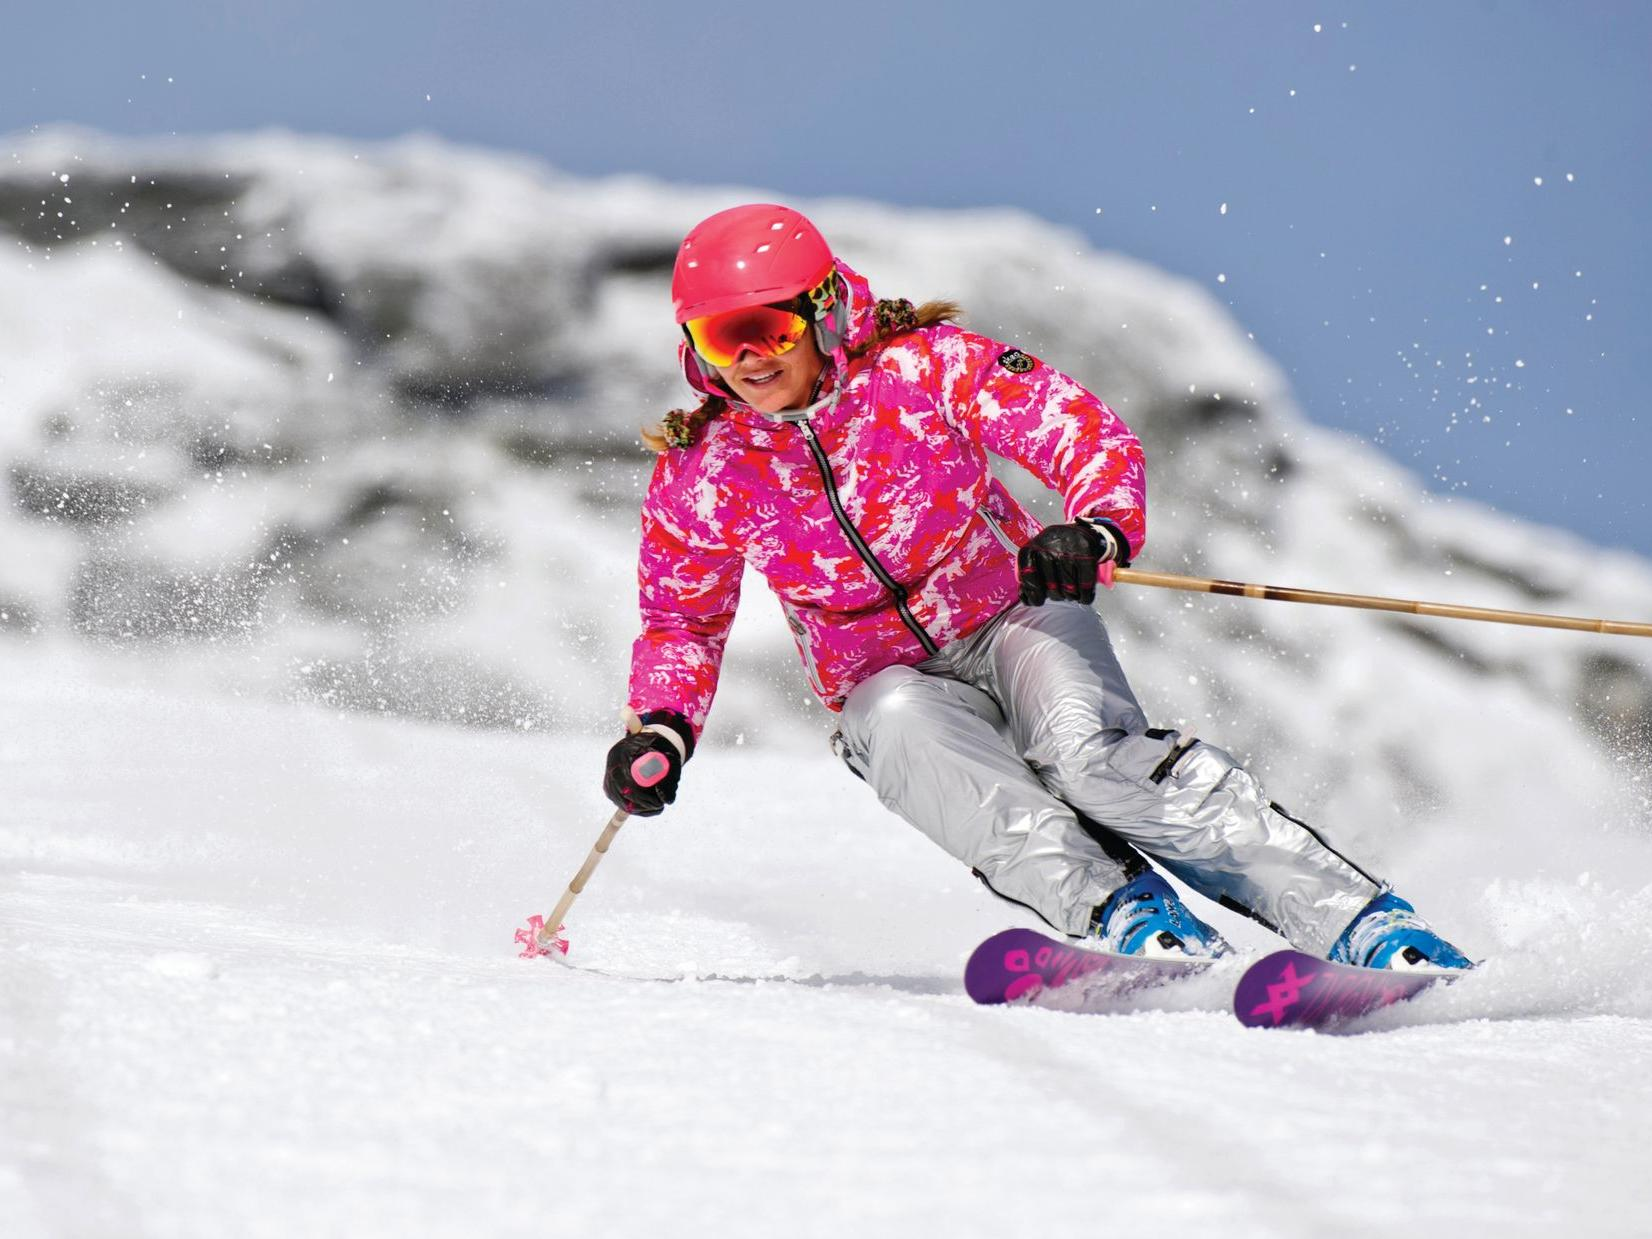 Skier in pink attire making a tight turn.